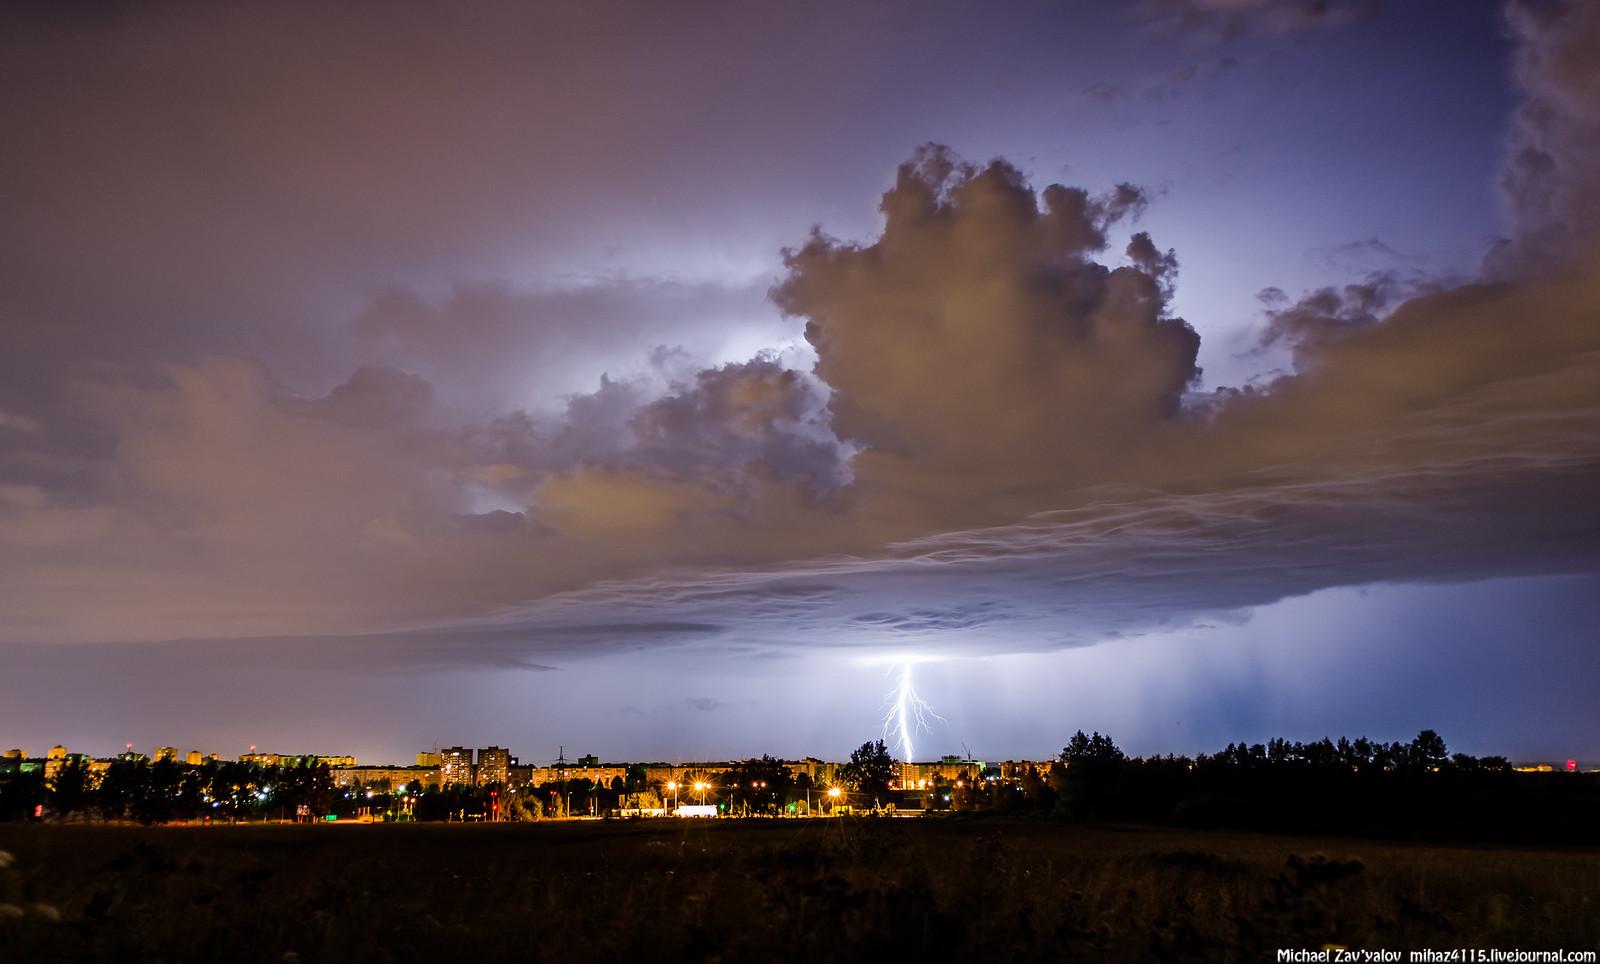 Night Thunder Storm 28 July 2014